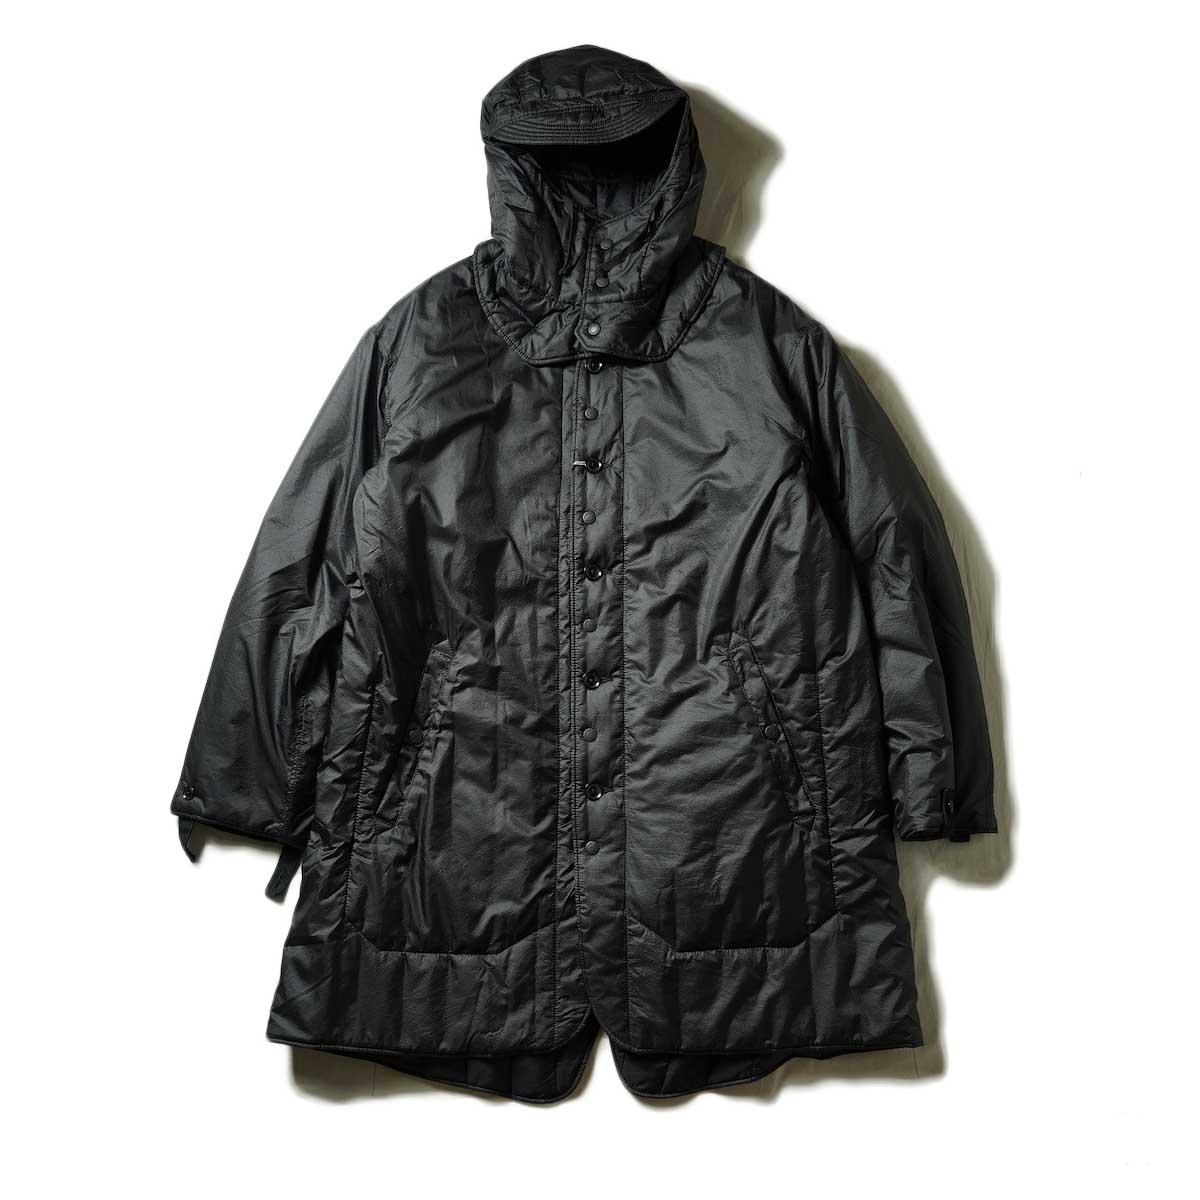 Engineered Garments / LINER JACKET - NYLON MICRO RIPSTOP (Black)